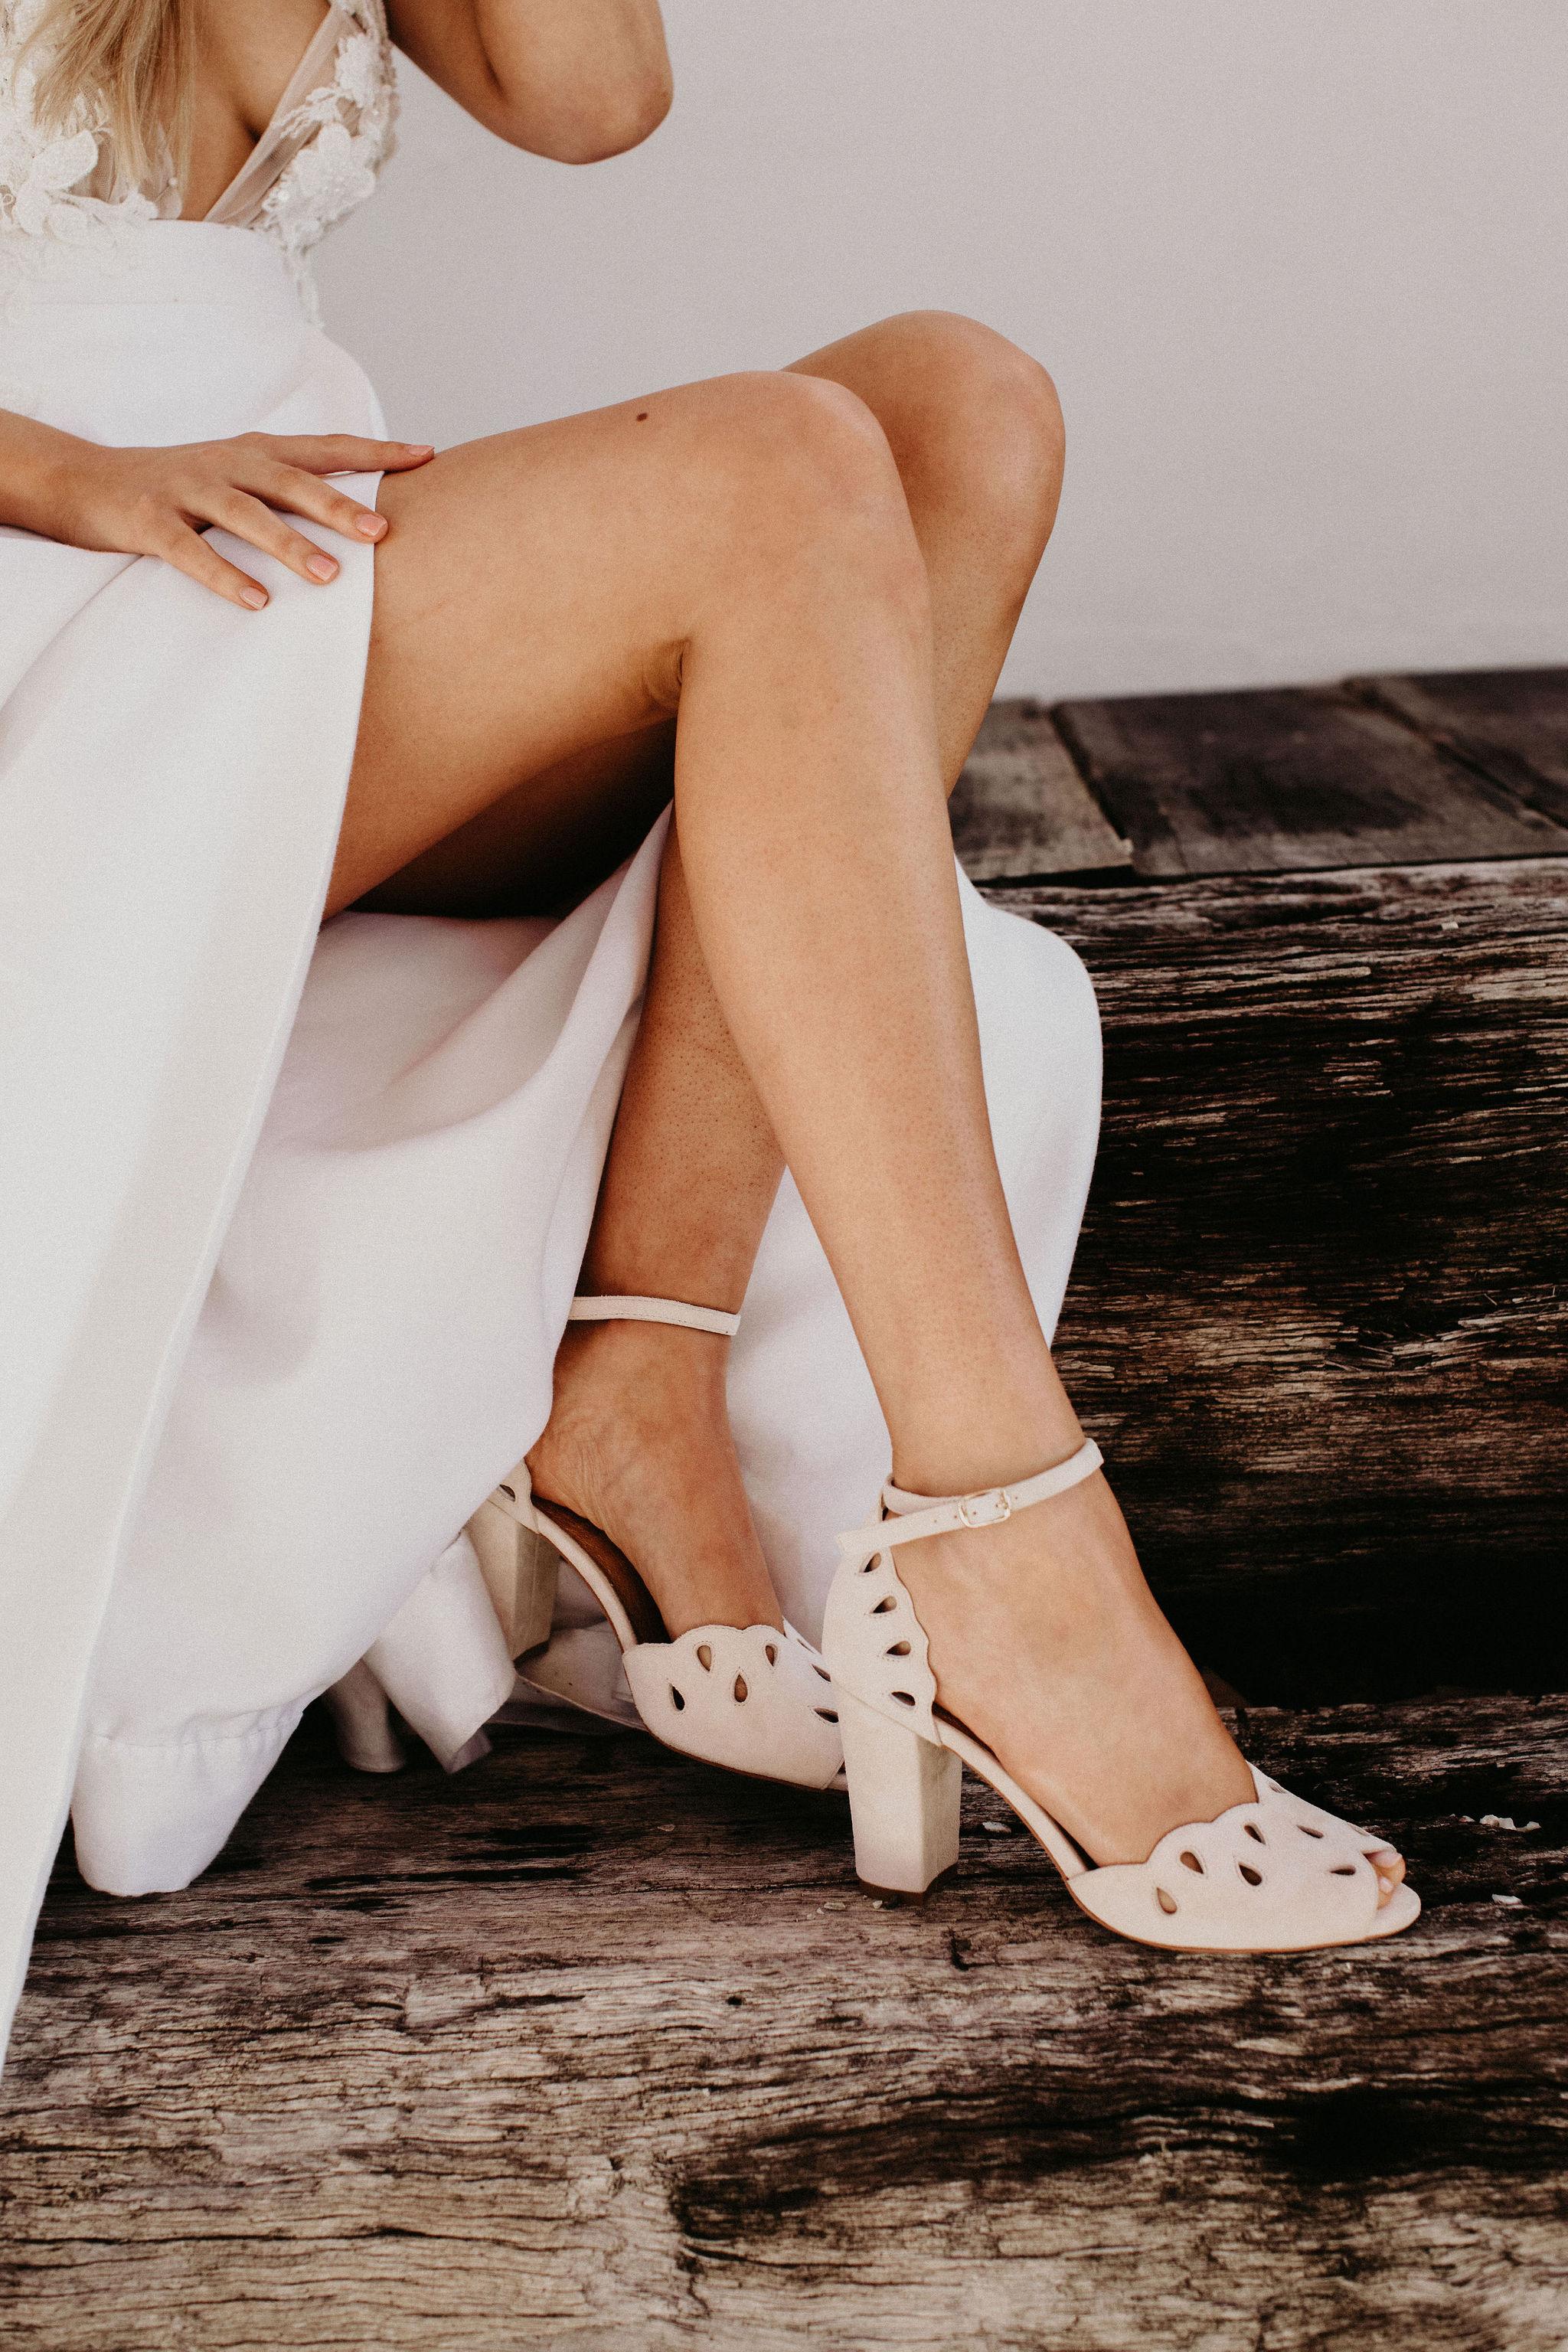 Vintage-Inspired Wedding Shoes